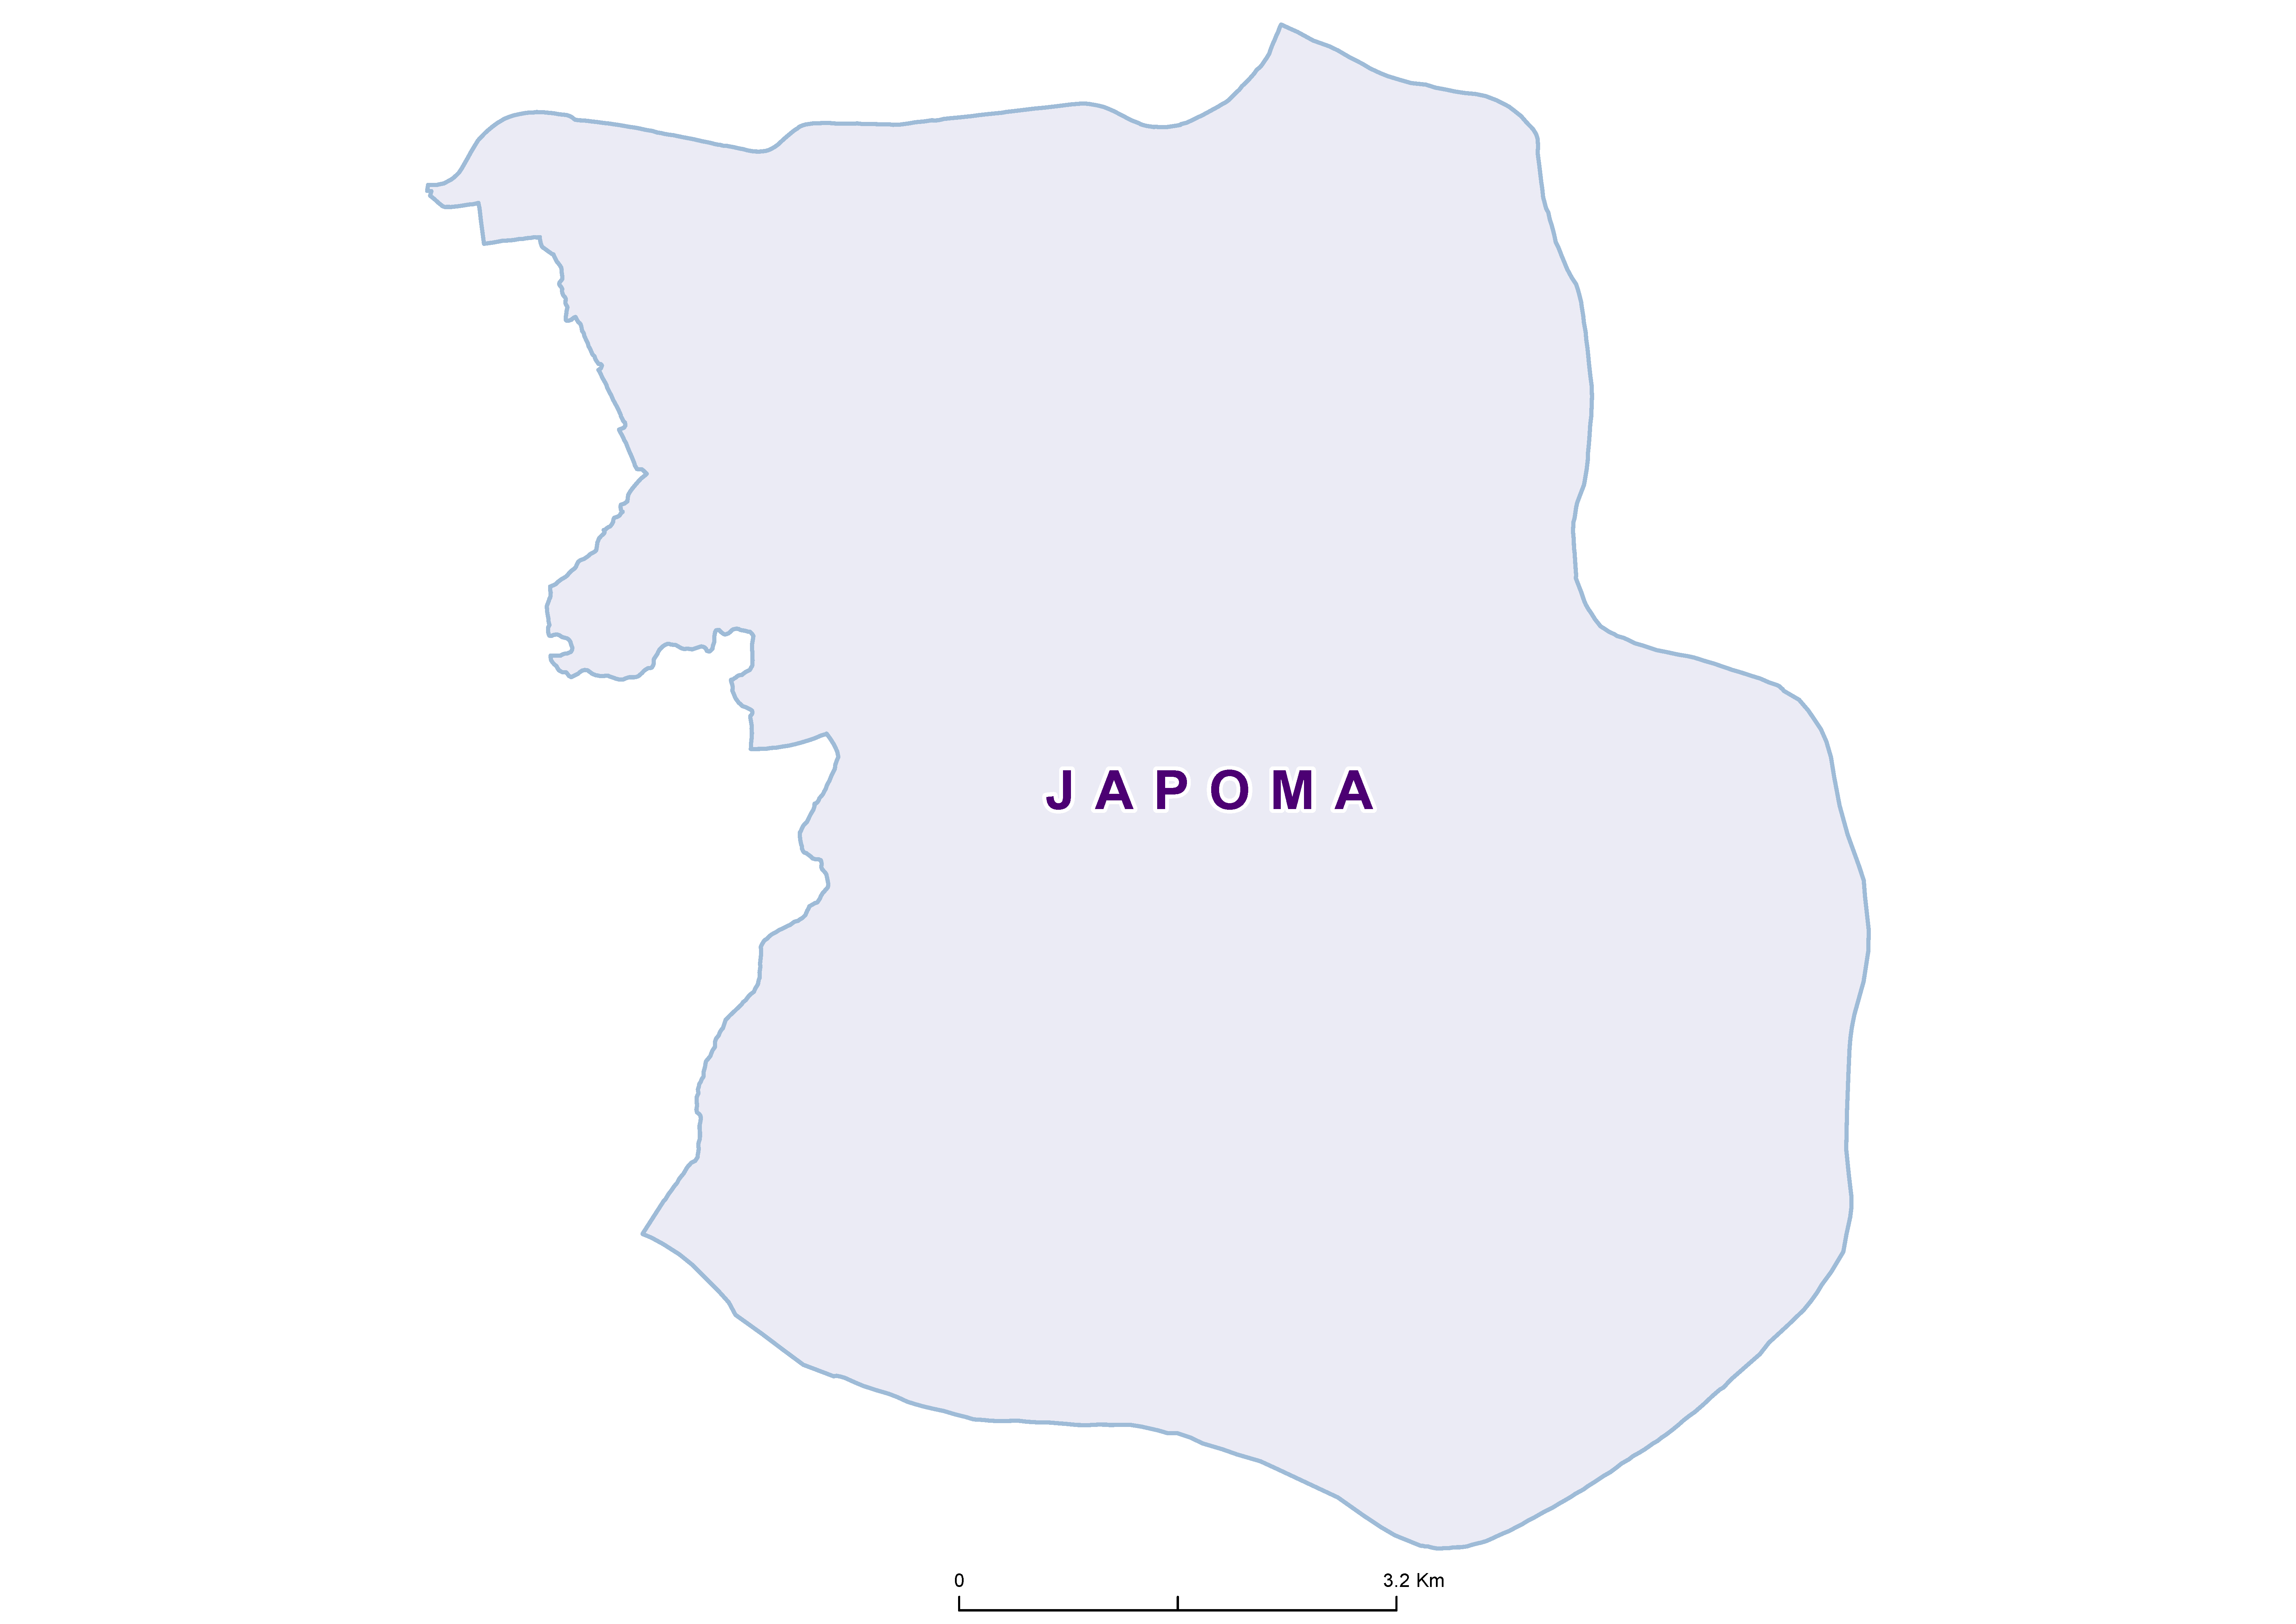 Japoma Max SCH 20180001